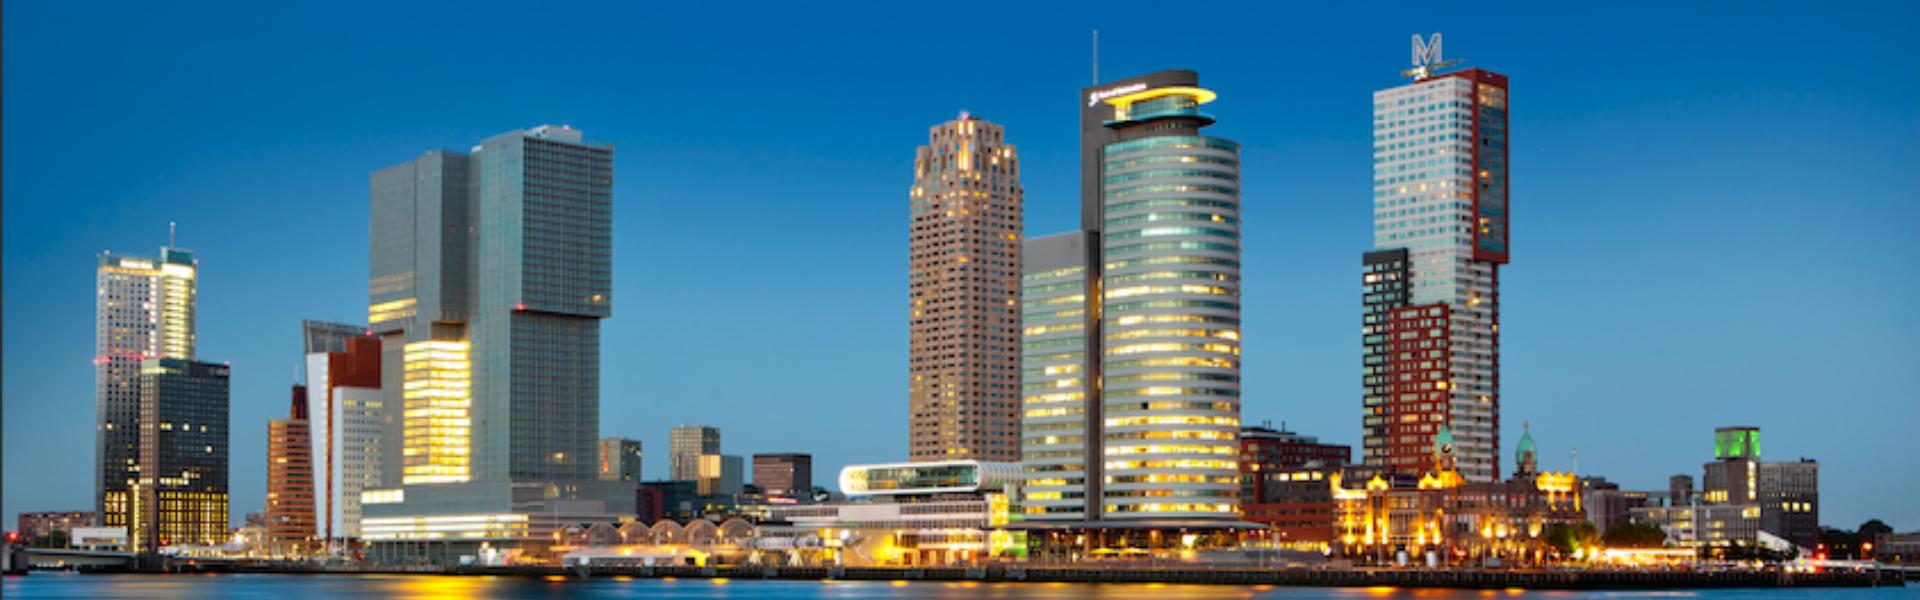 1454 Rotterdam Image Bank Klein